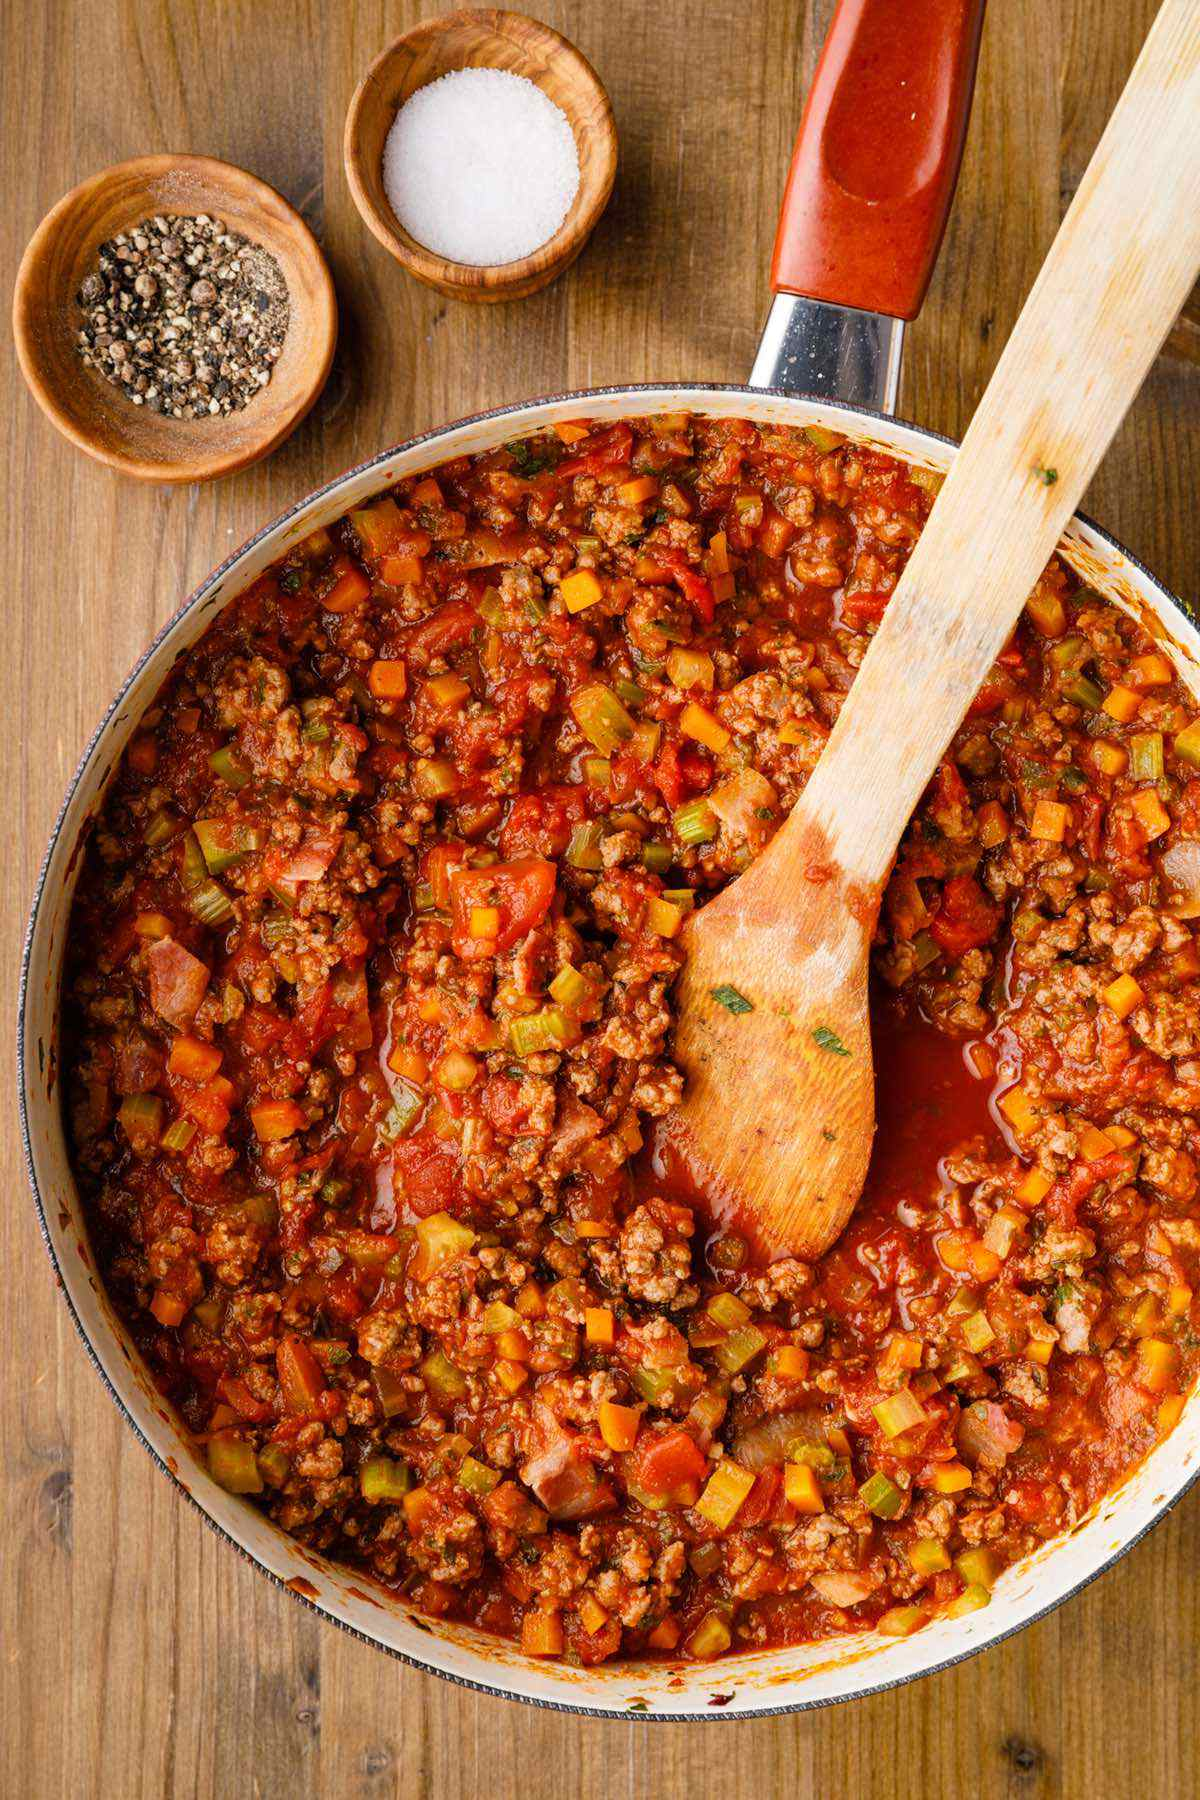 prepping bolognese sauce